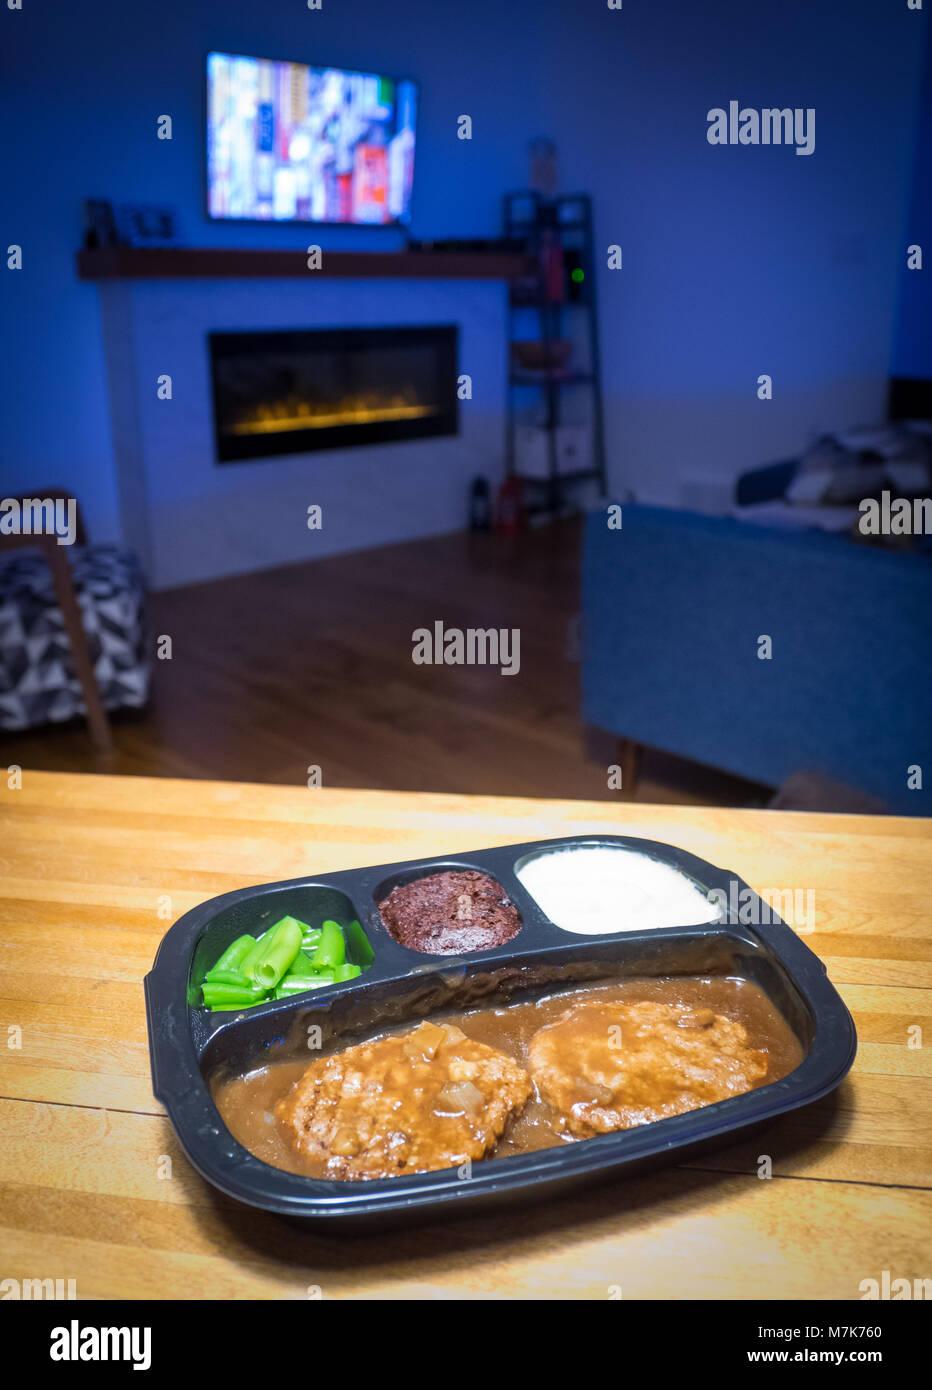 A Swanson Hungry-Man salisbury steak TV dinner (frozen dinner). - Stock Image